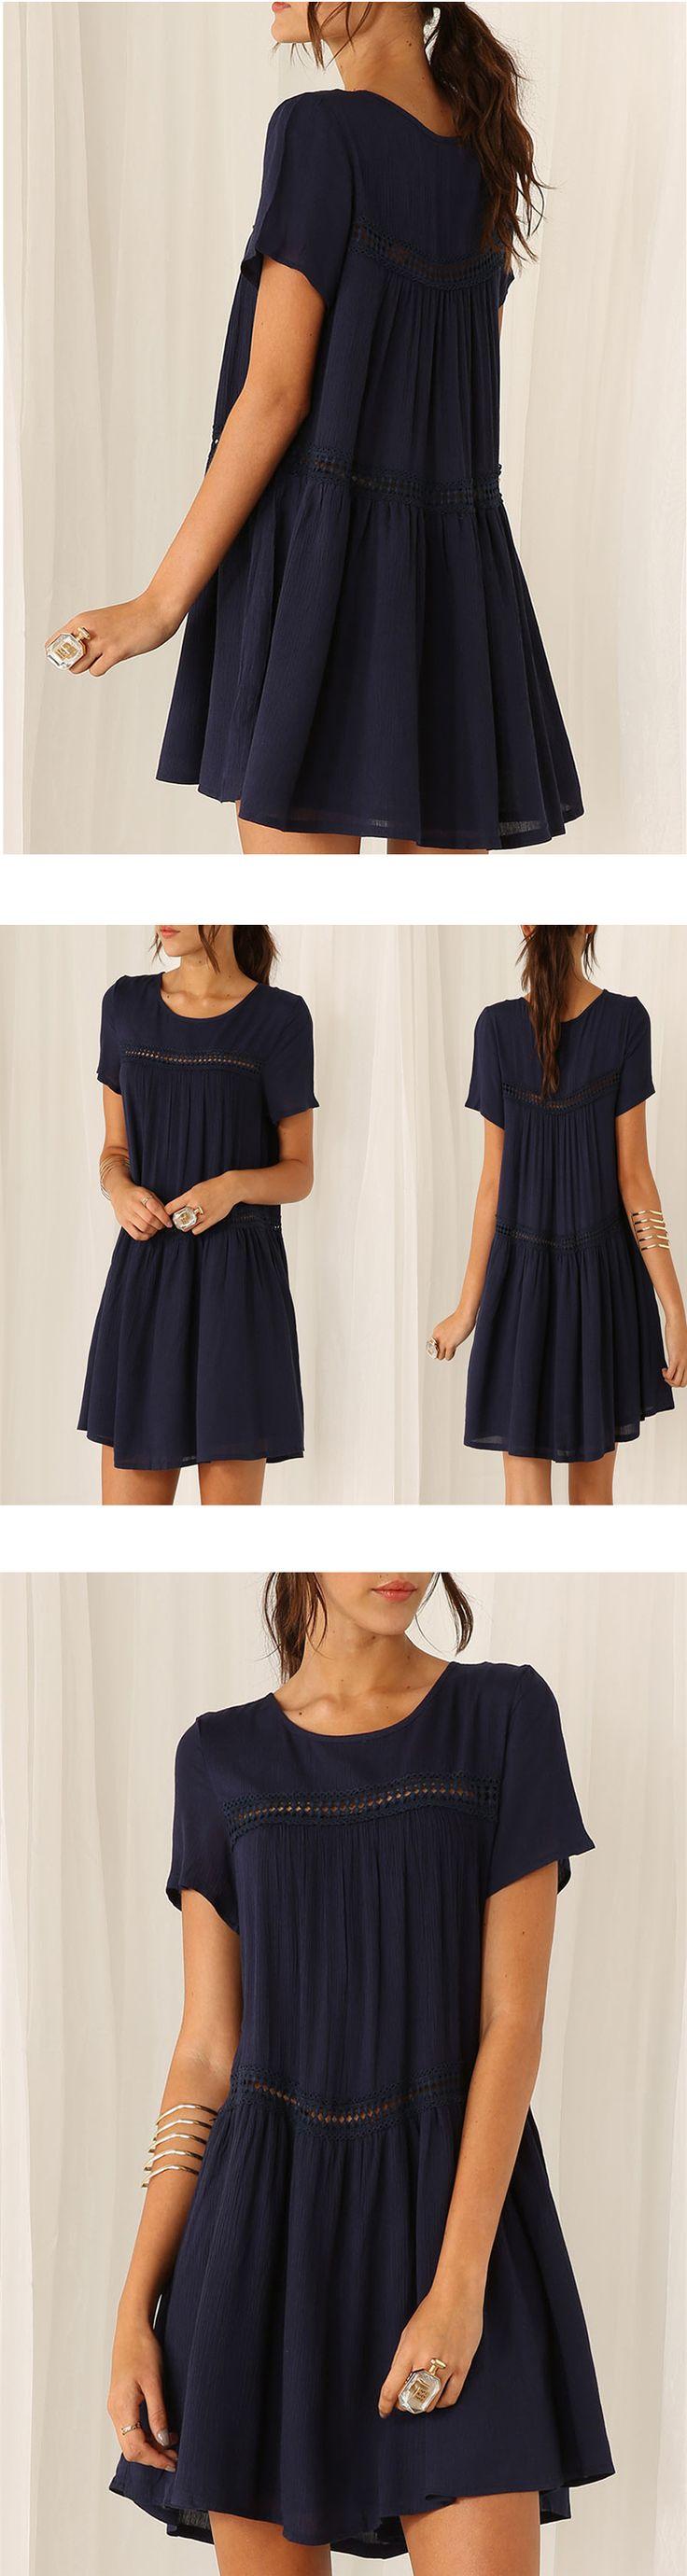 Navy Short Sleeve Shift Dress -SheIn(Sheinside)